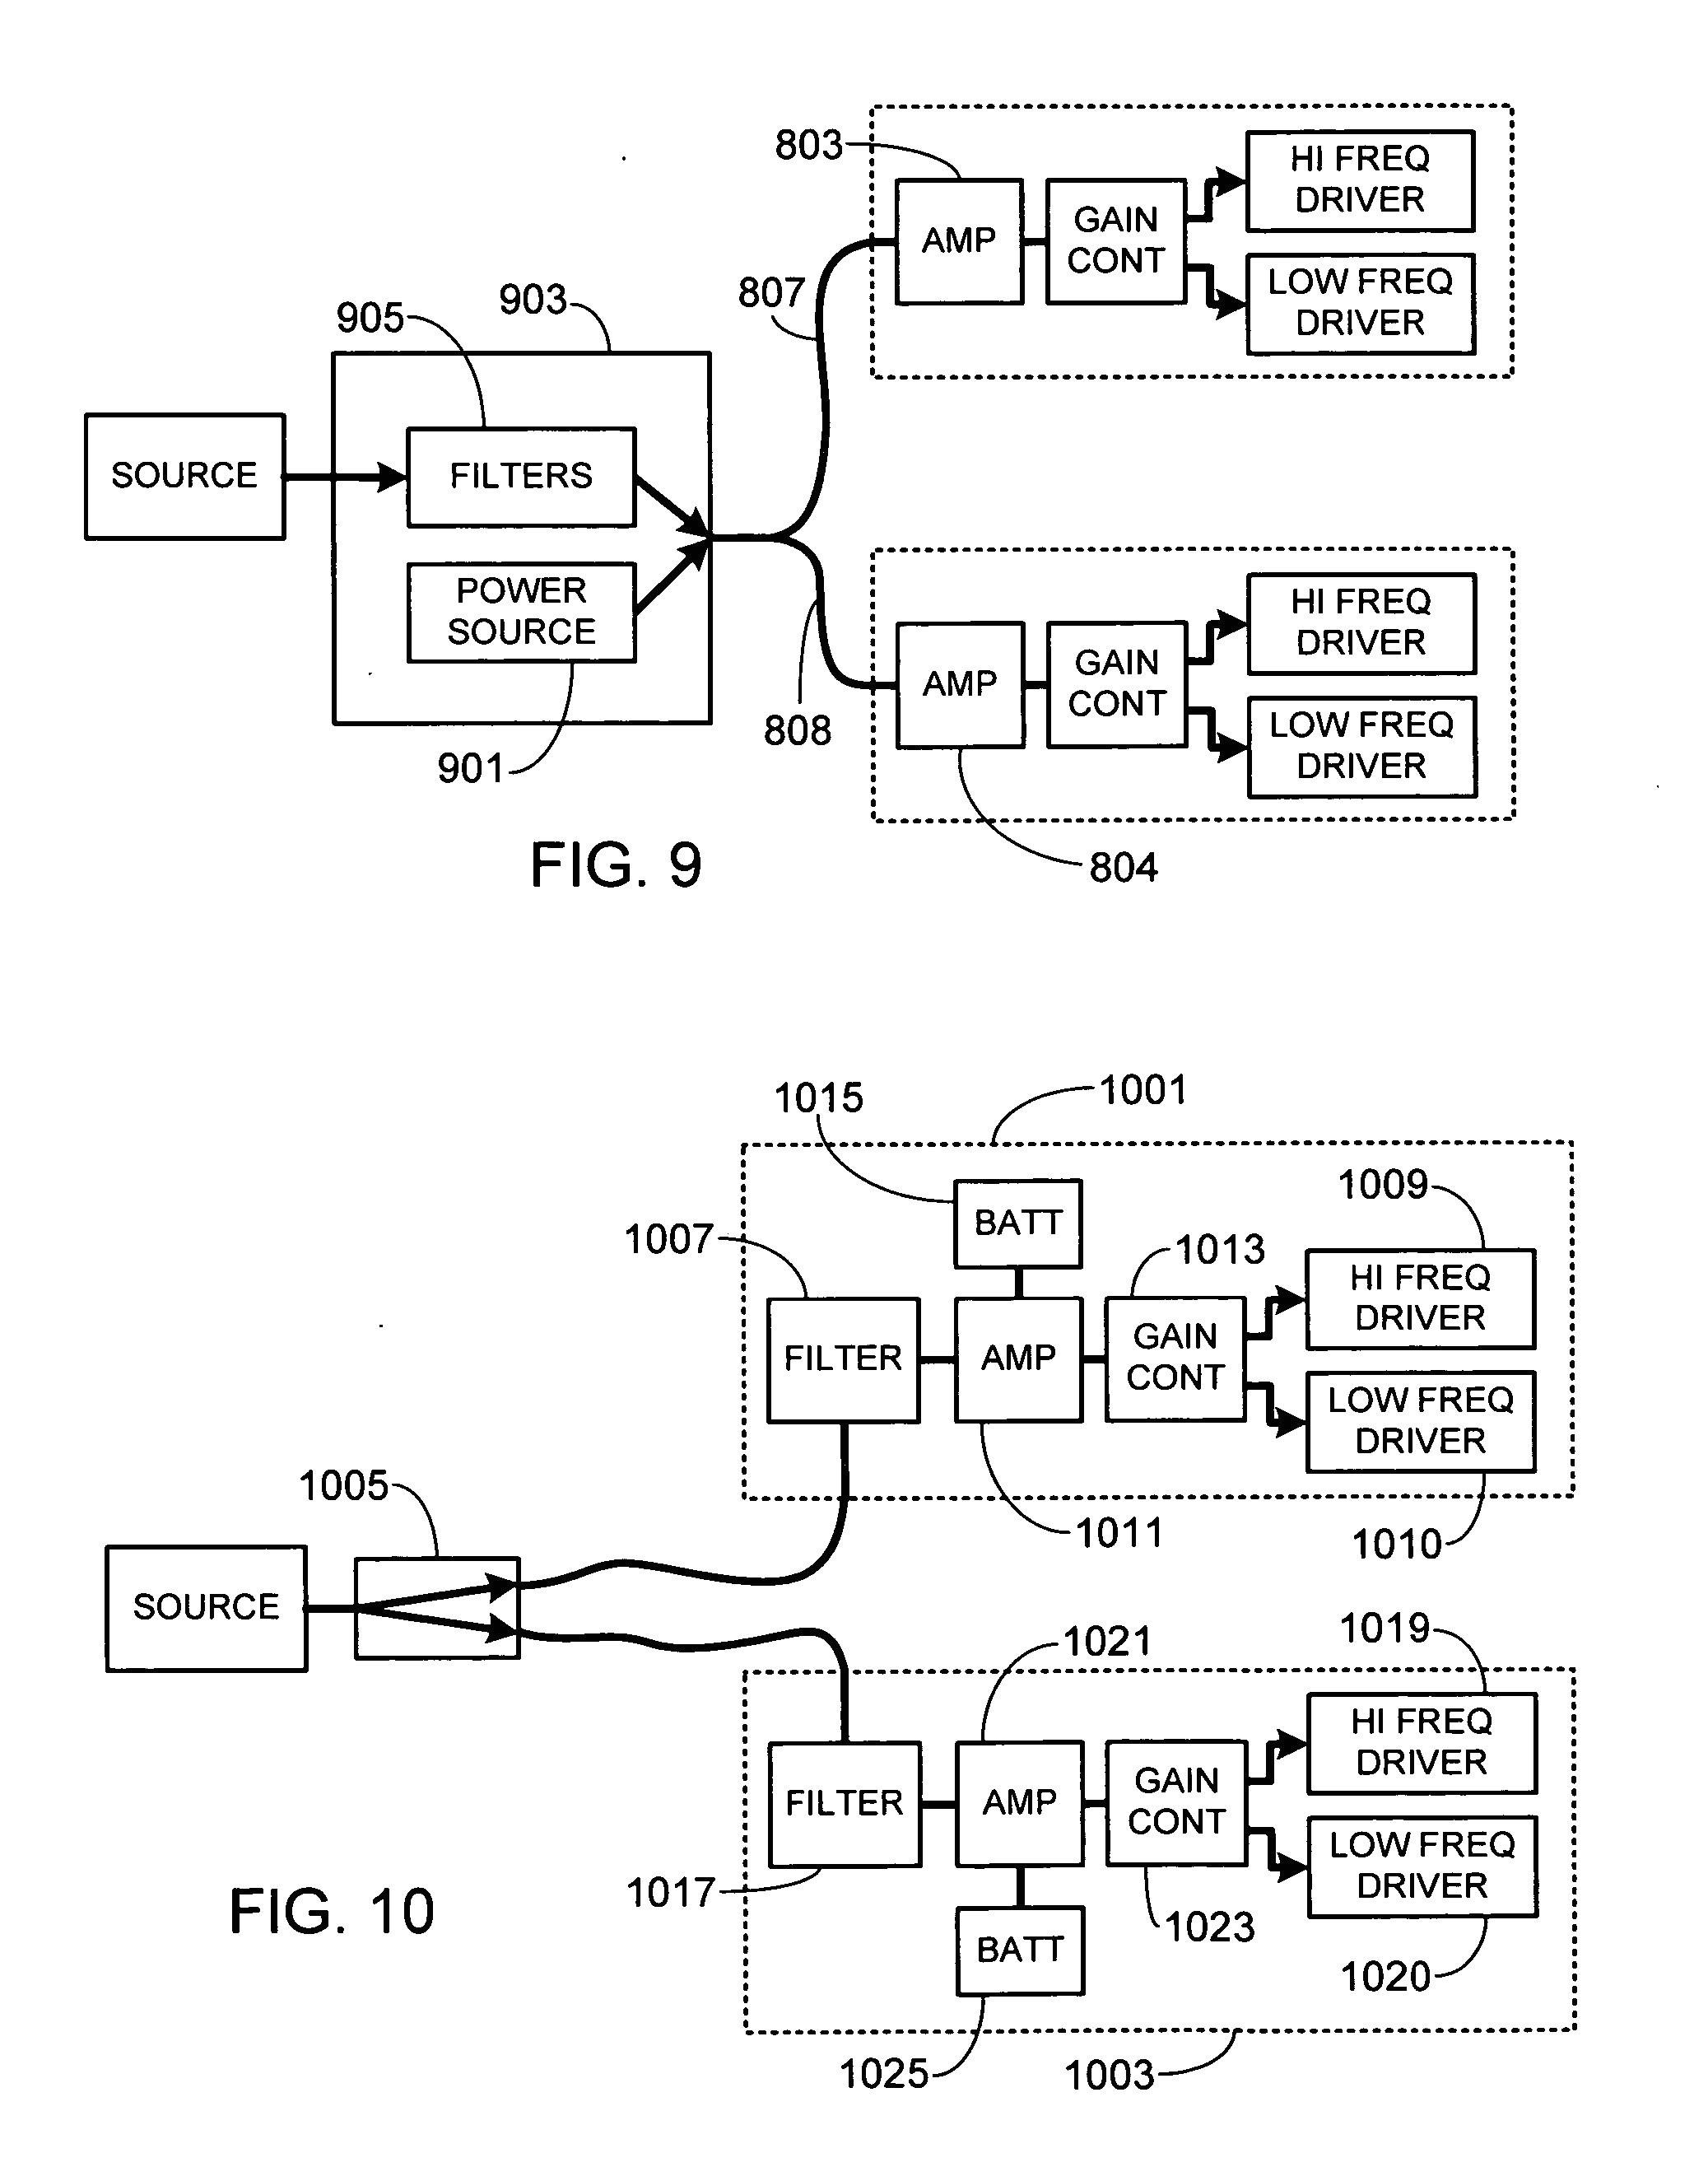 hvac wiring diagram inspirational guitar wiring diagrams valid easy guitar wiring diagram valid fresh photograph of